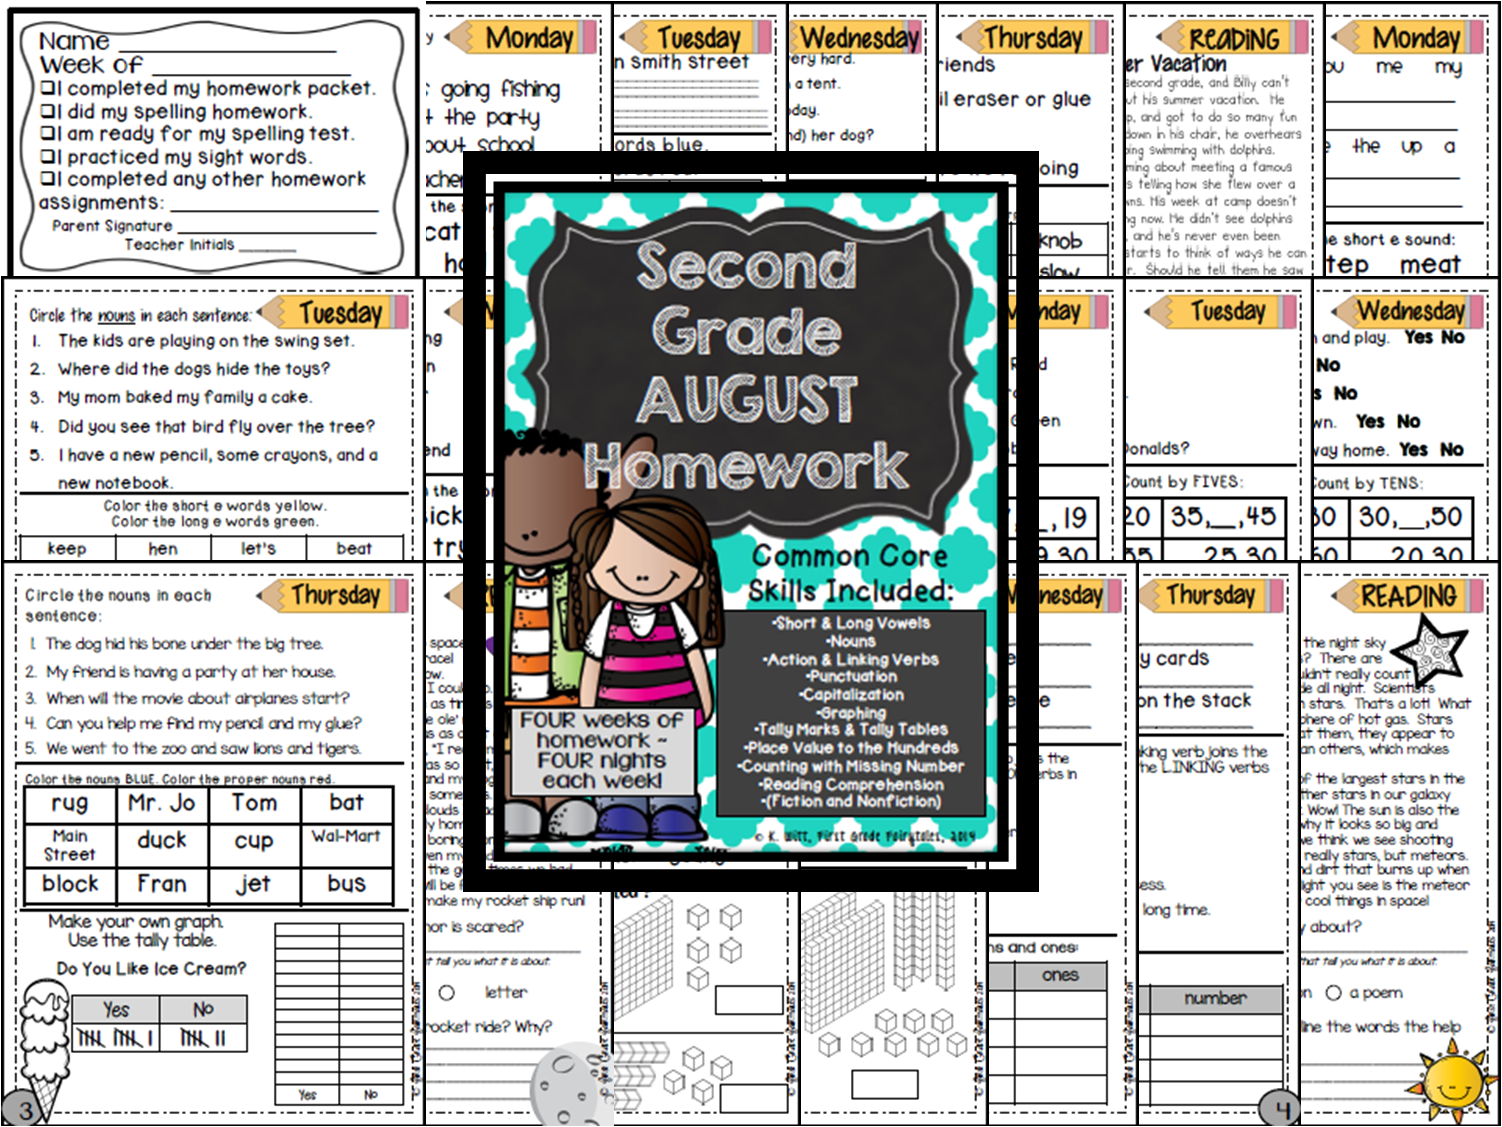 http://www.teacherspayteachers.com/Product/Second-Grade-Common-Core-Homework-August-1396462